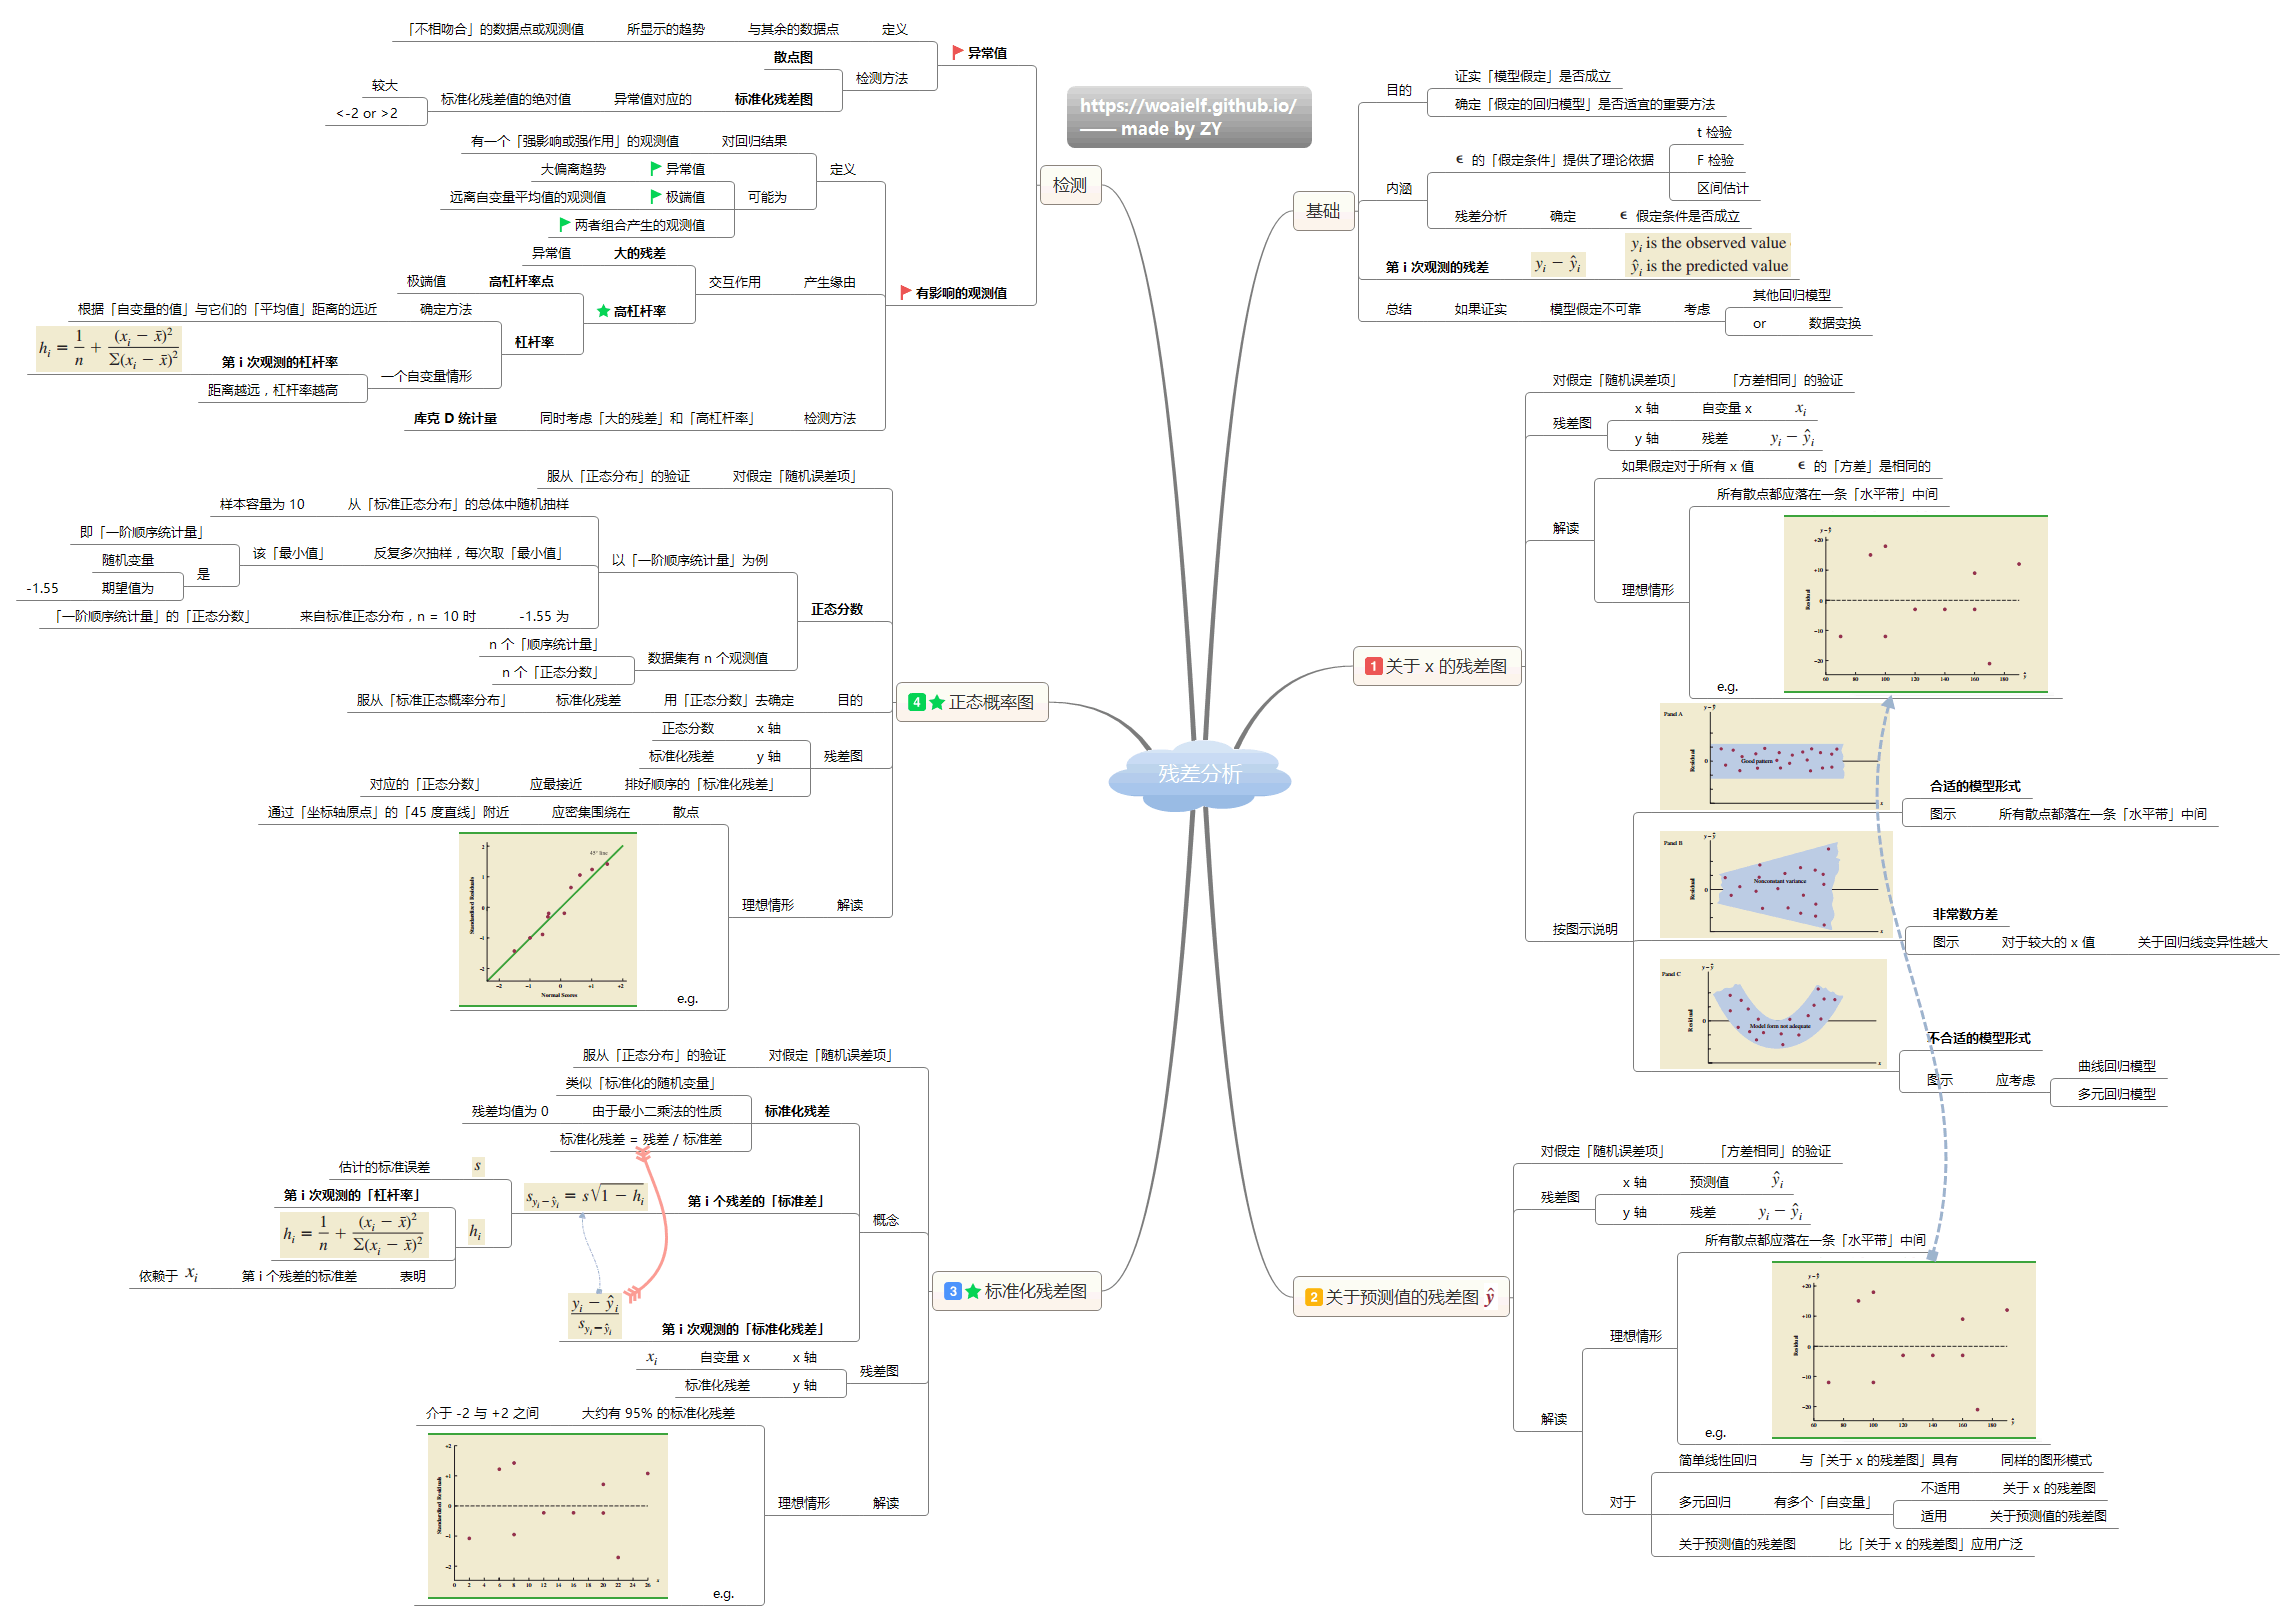 13-残差分析.png